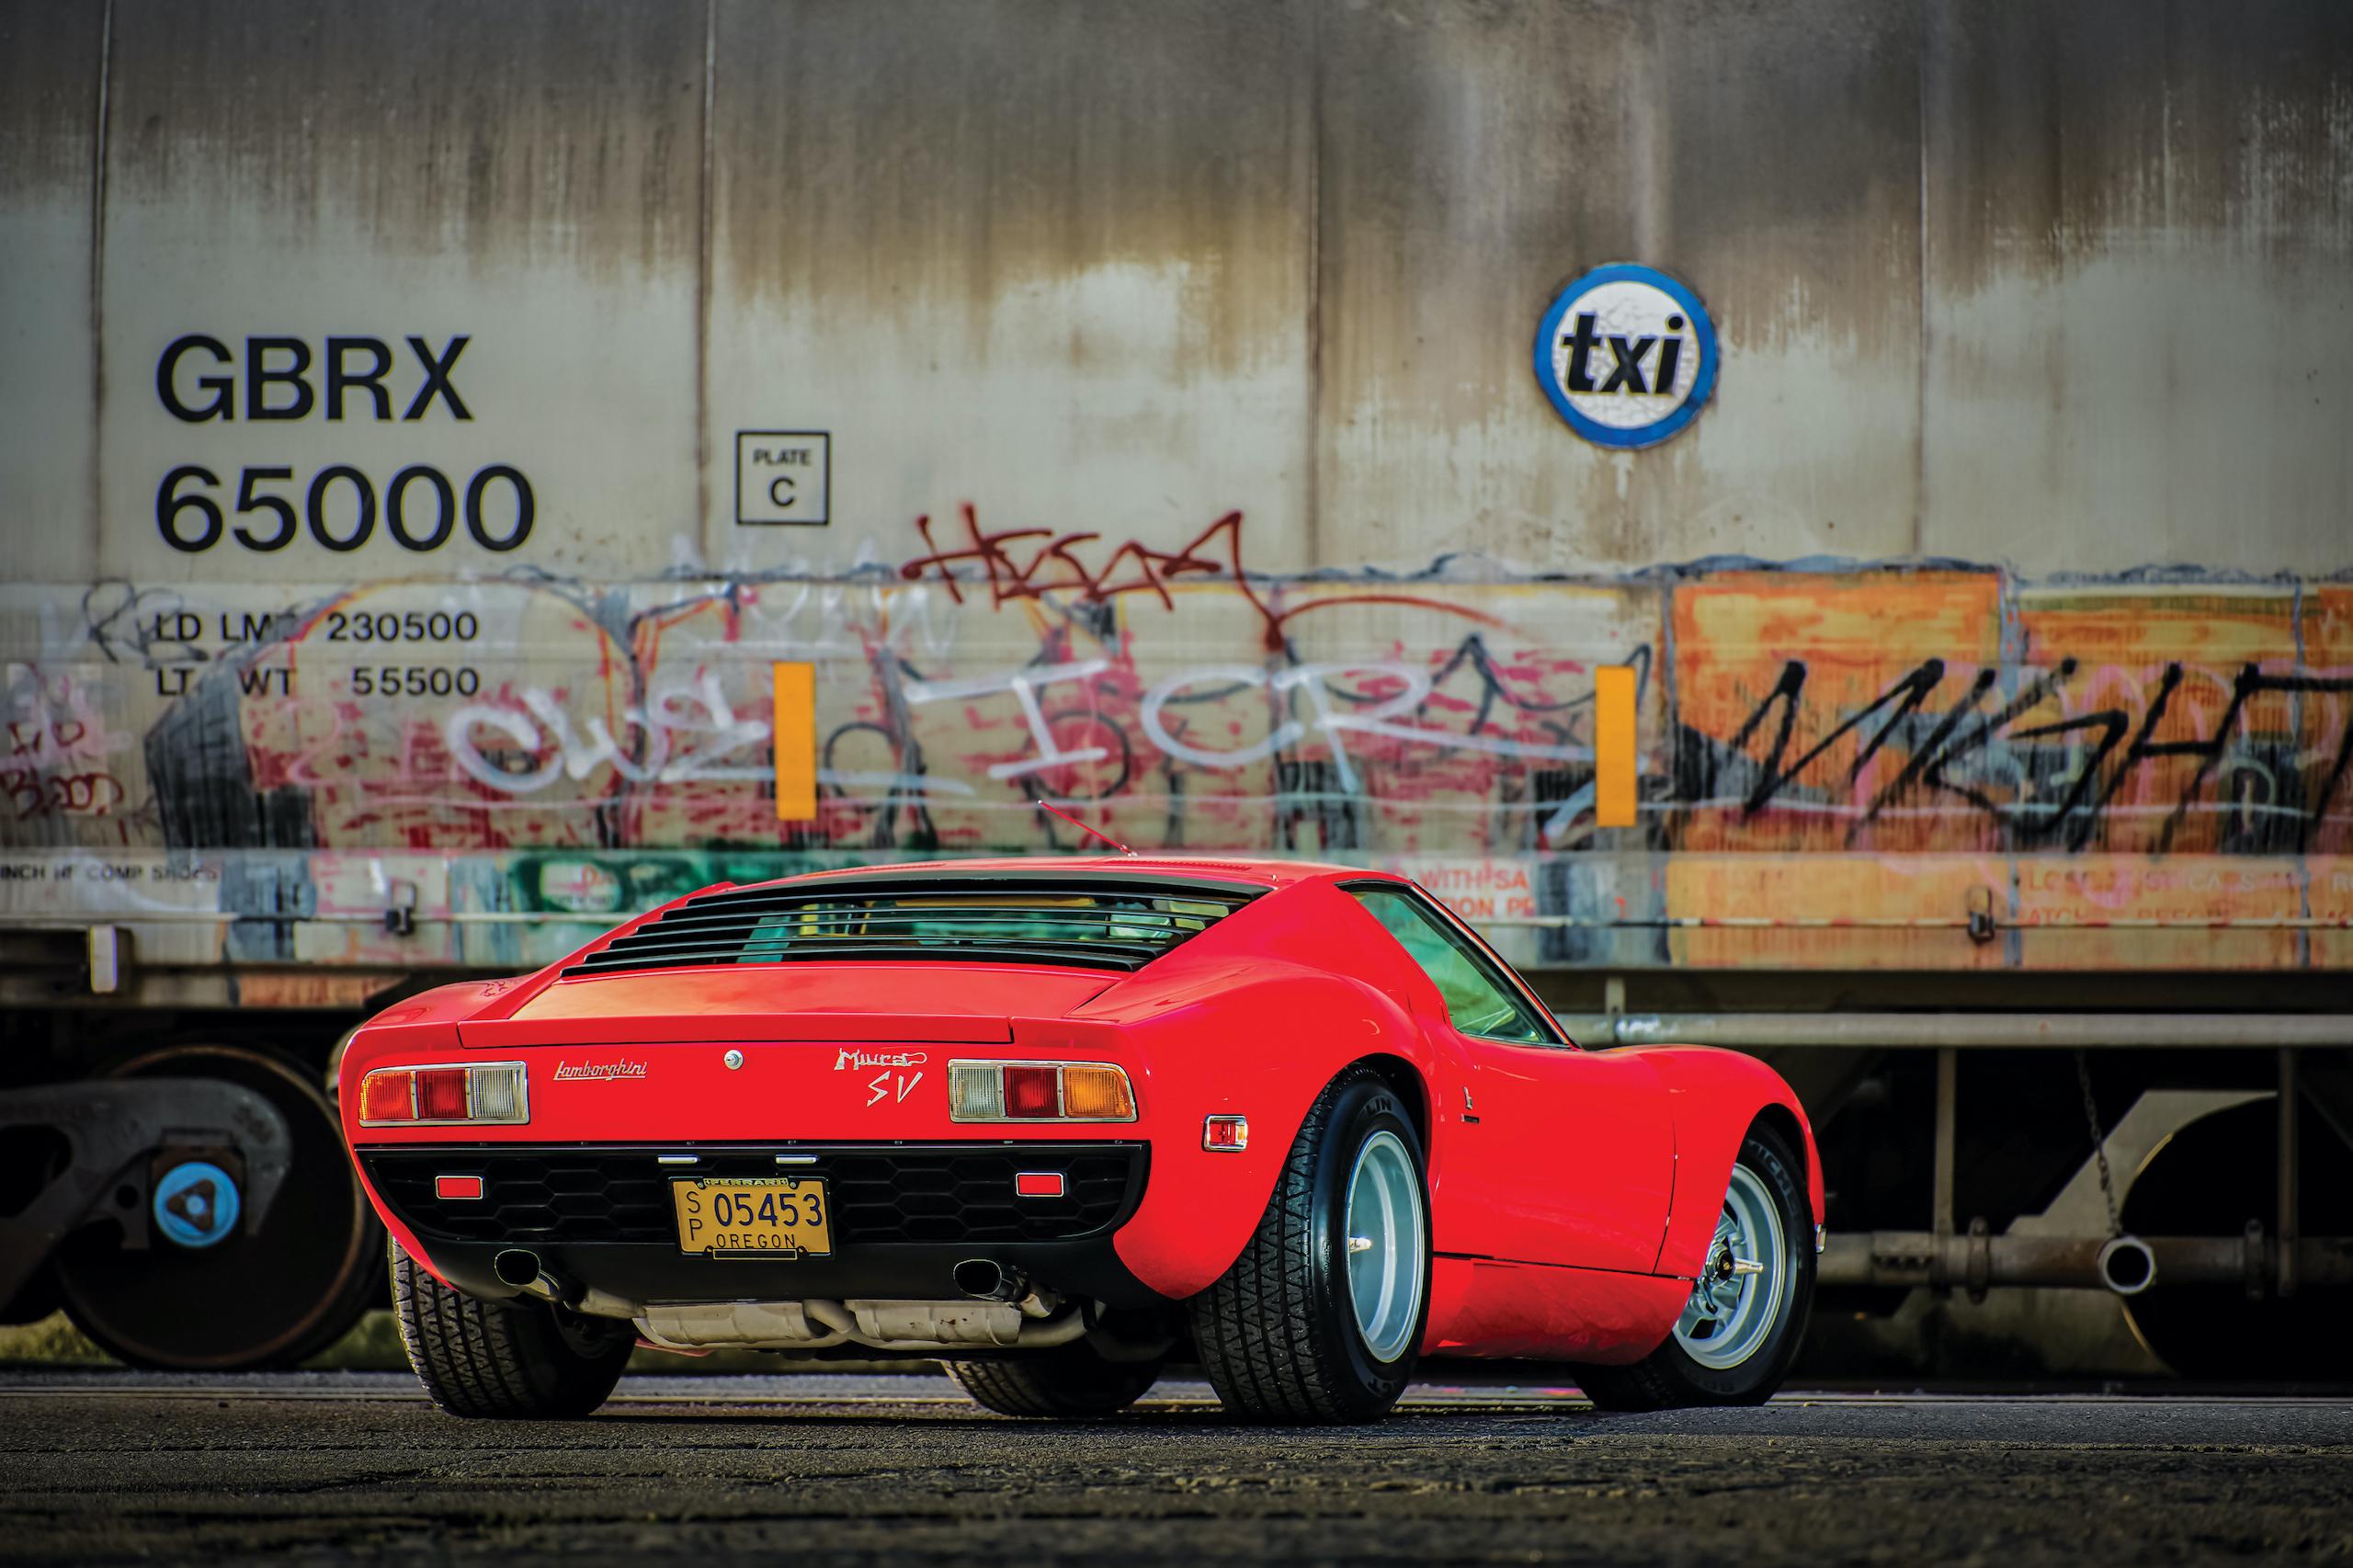 1971 Lamborghini Miura P400 SV rear three-quarter